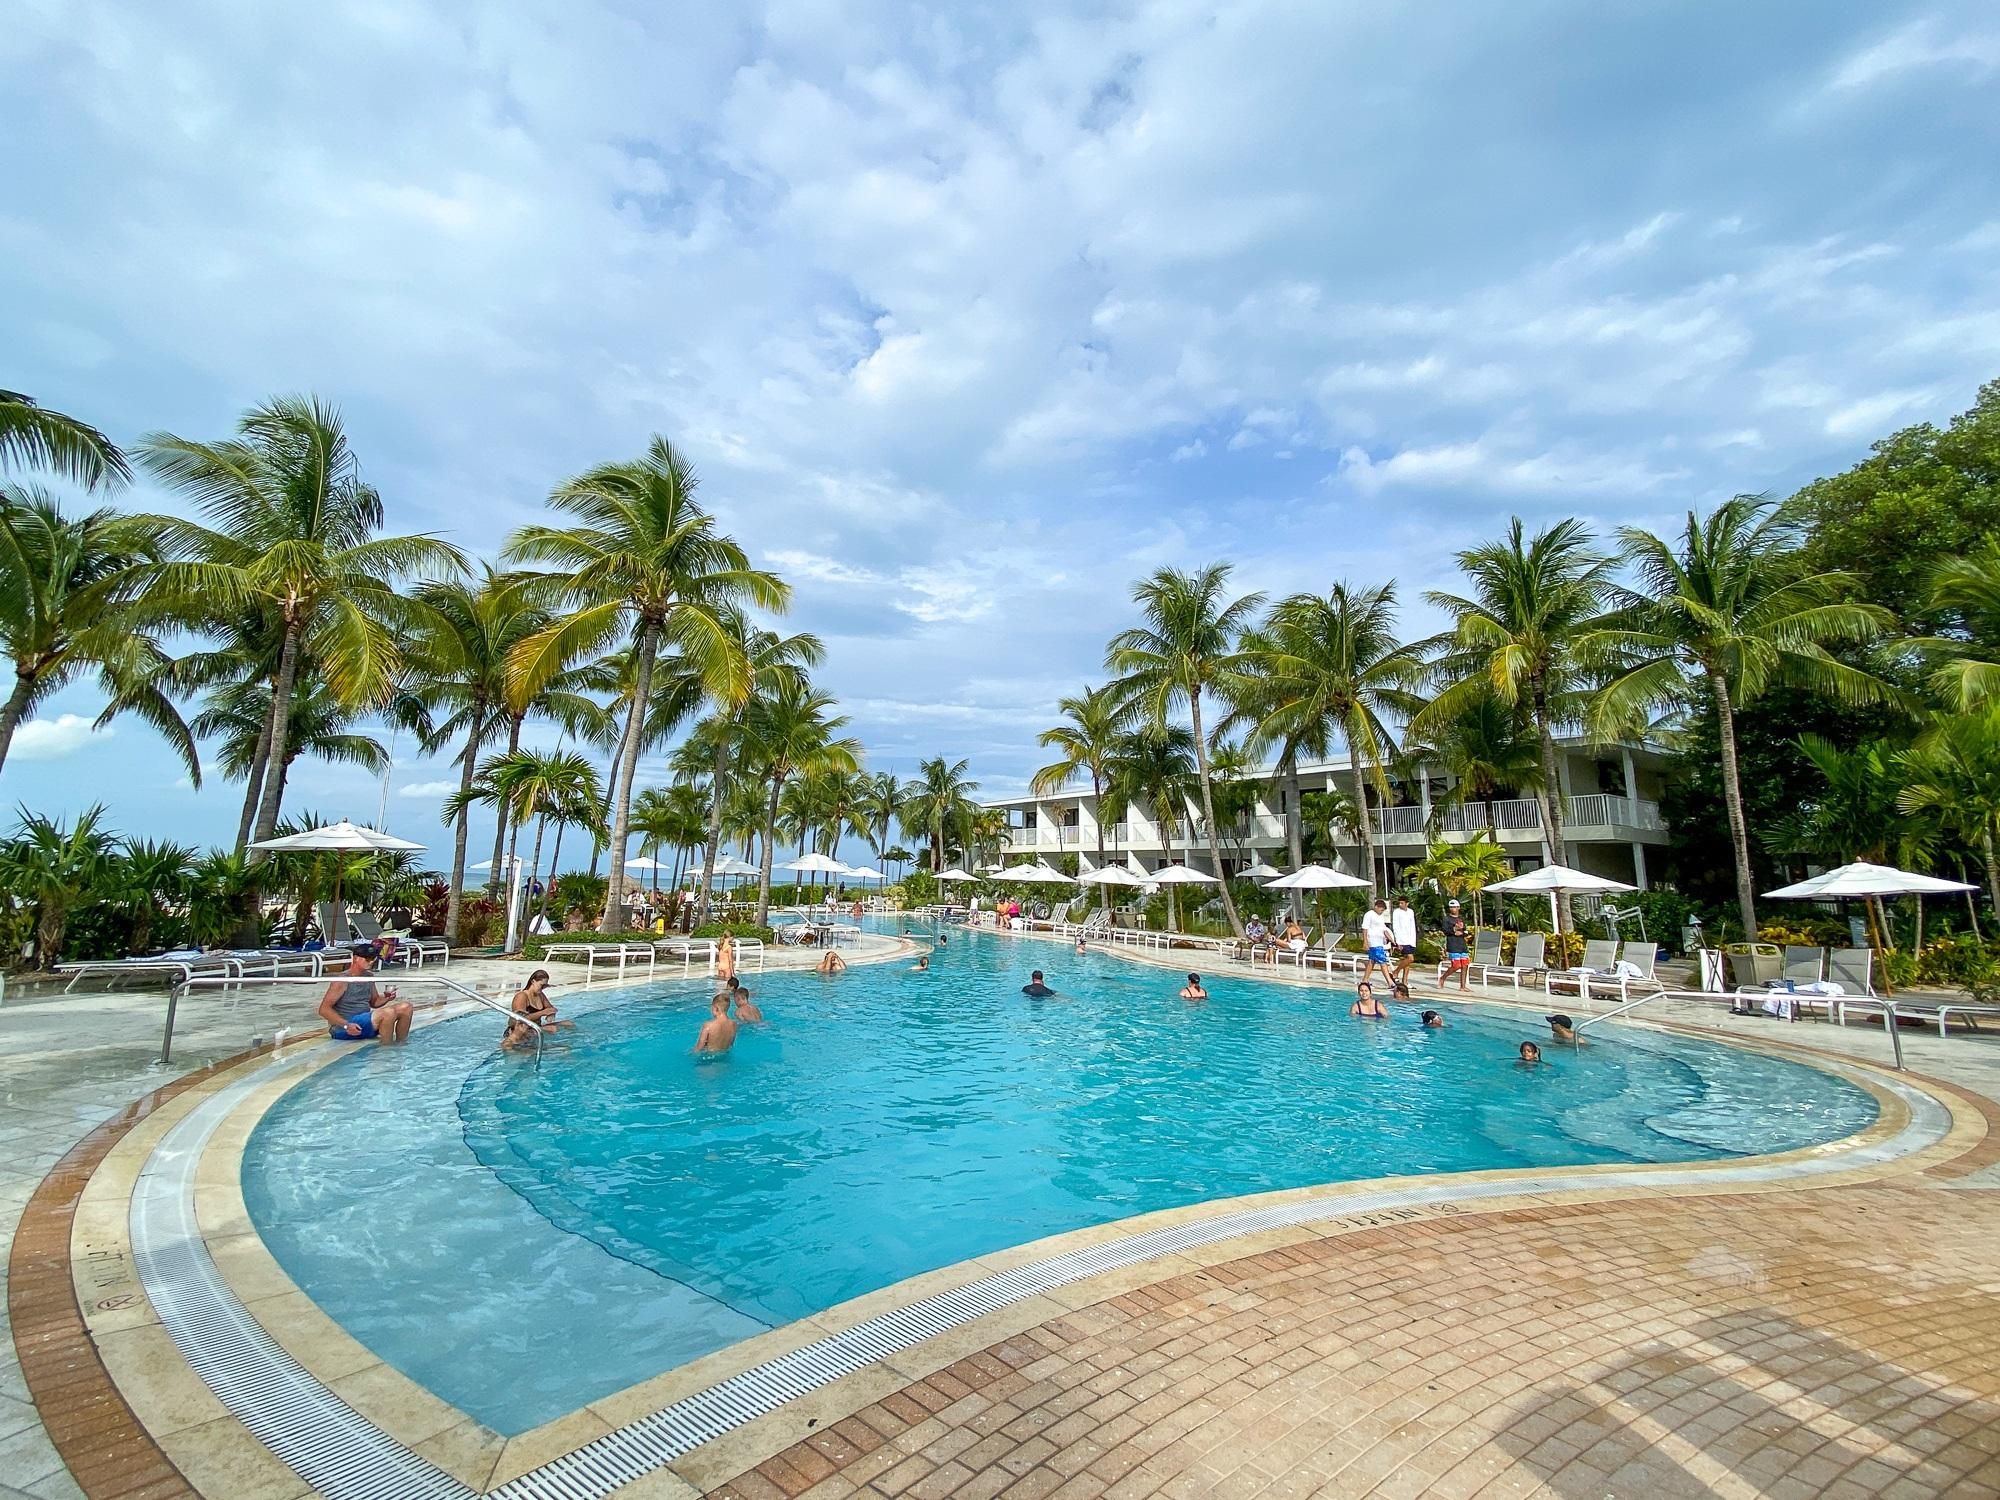 Main Hawks Cay Resort Pool